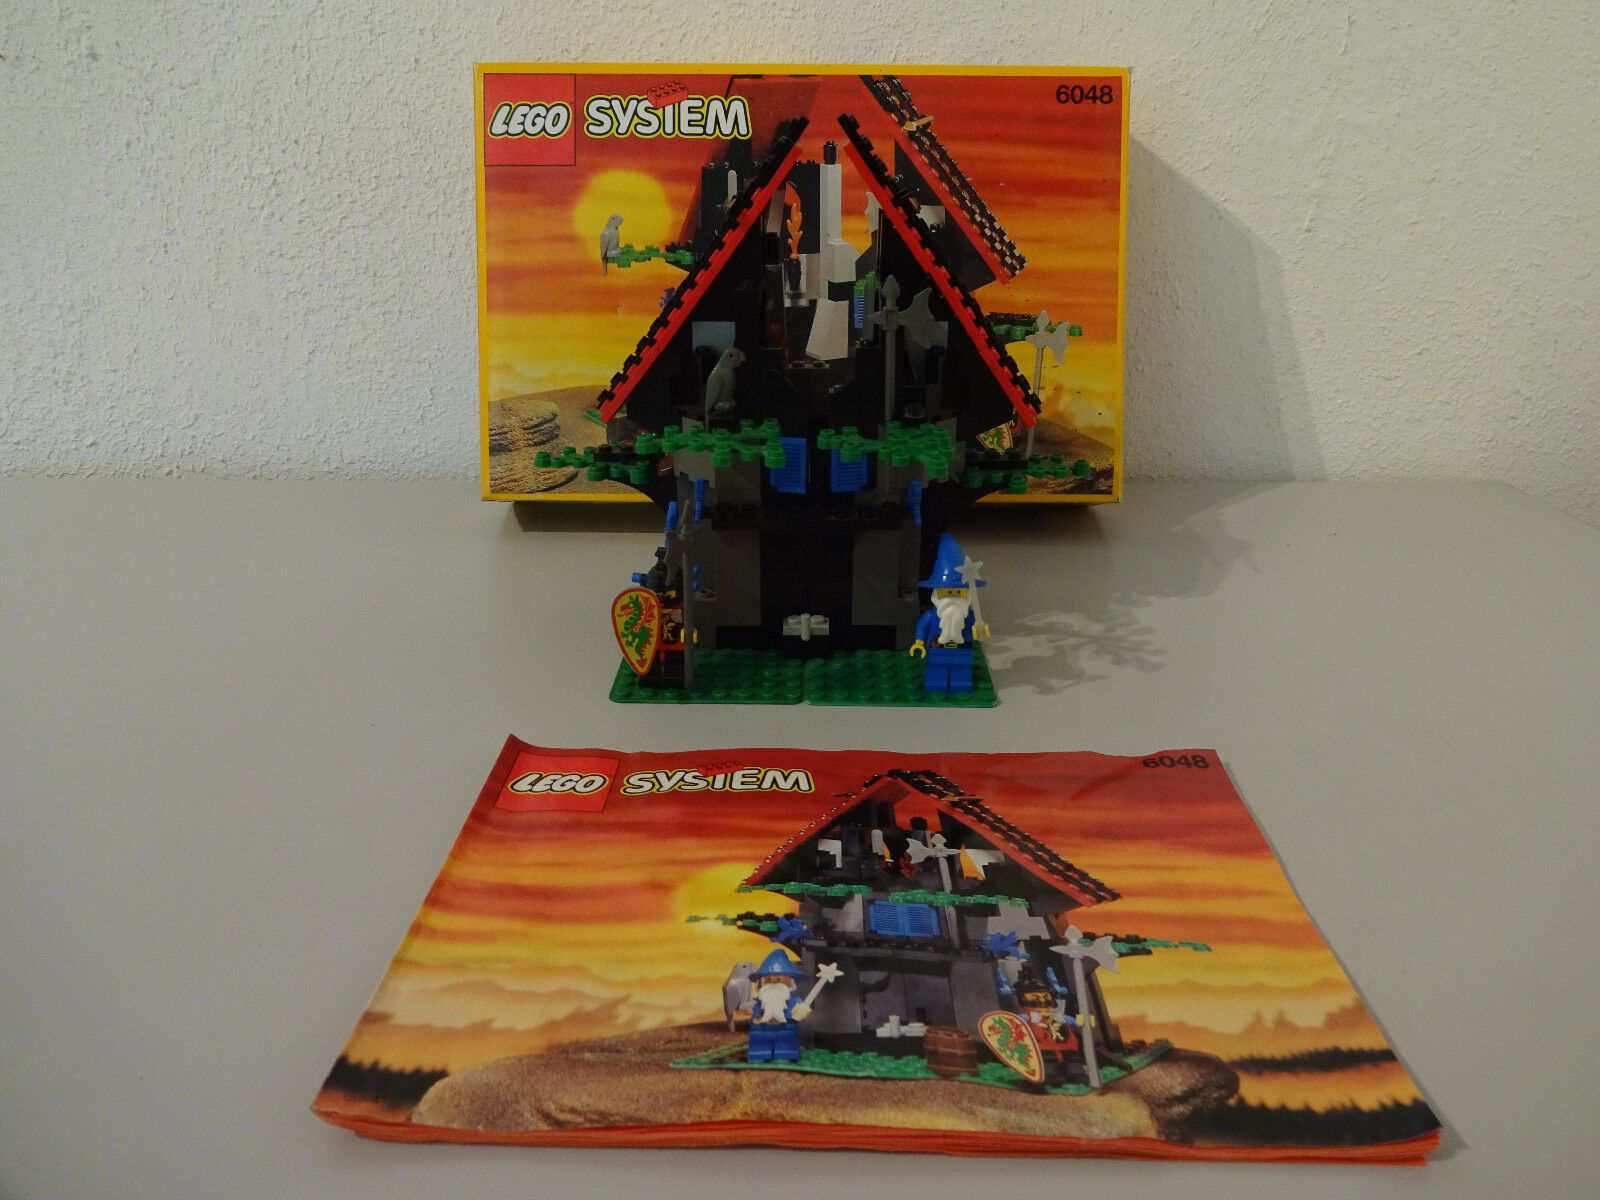 (GO)LEGO (GO)LEGO (GO)LEGO SYSTEM 6048 MAJISTO'S MAGICAL SHOP WITH & BA 100% COMPLETE USED 2754b5